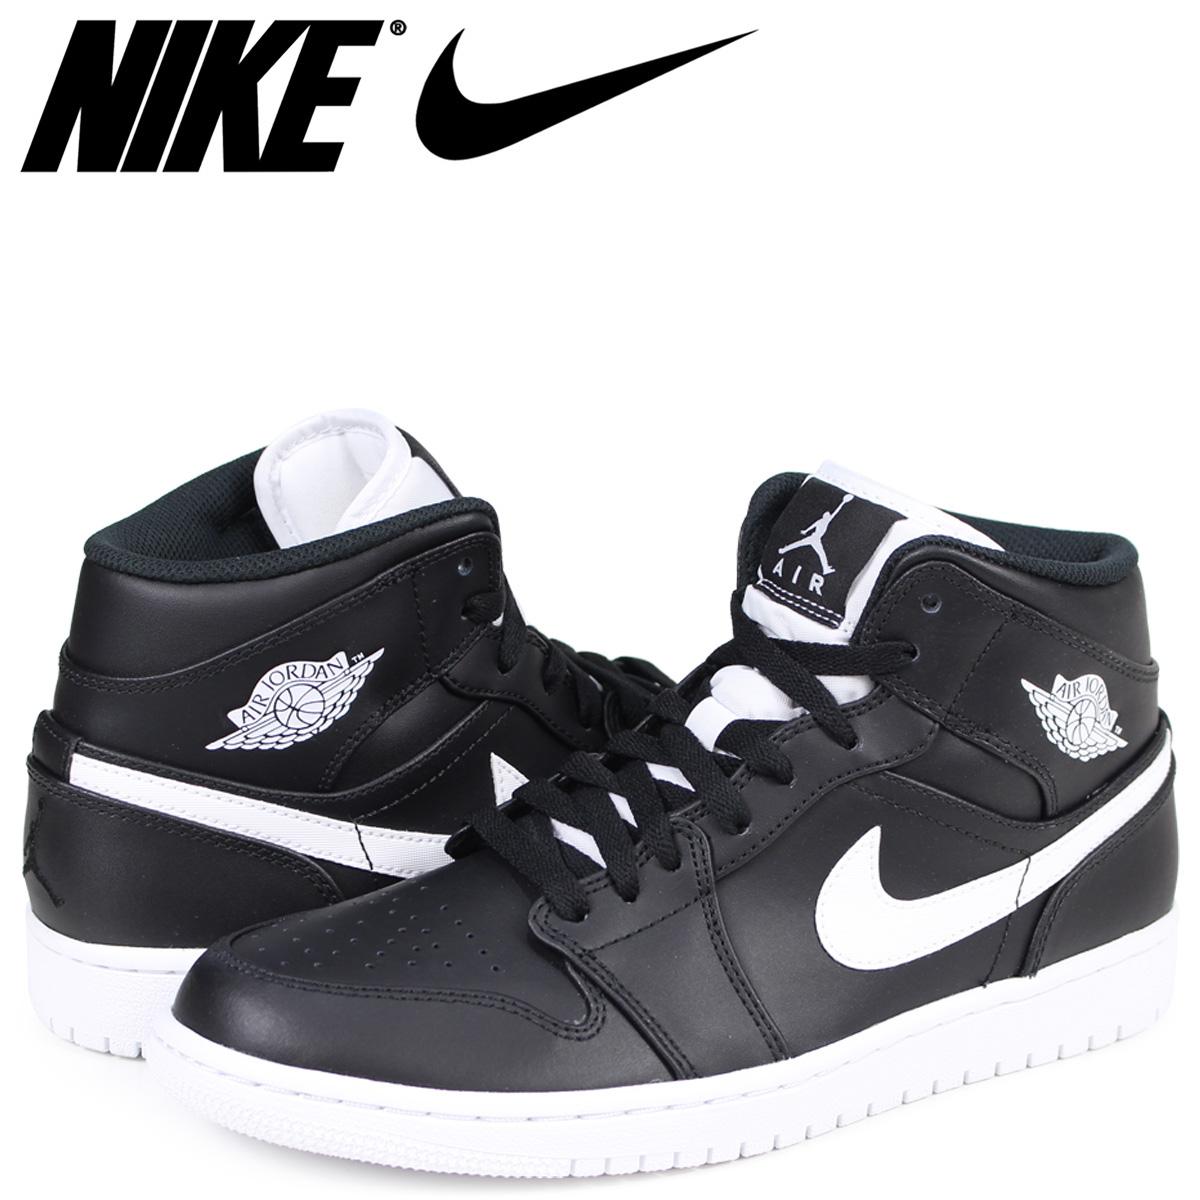 the latest a1726 bb2c1 NIKE AIR JORDAN 1 MID Nike Air Jordan 1 sneakers men black 554,724-038